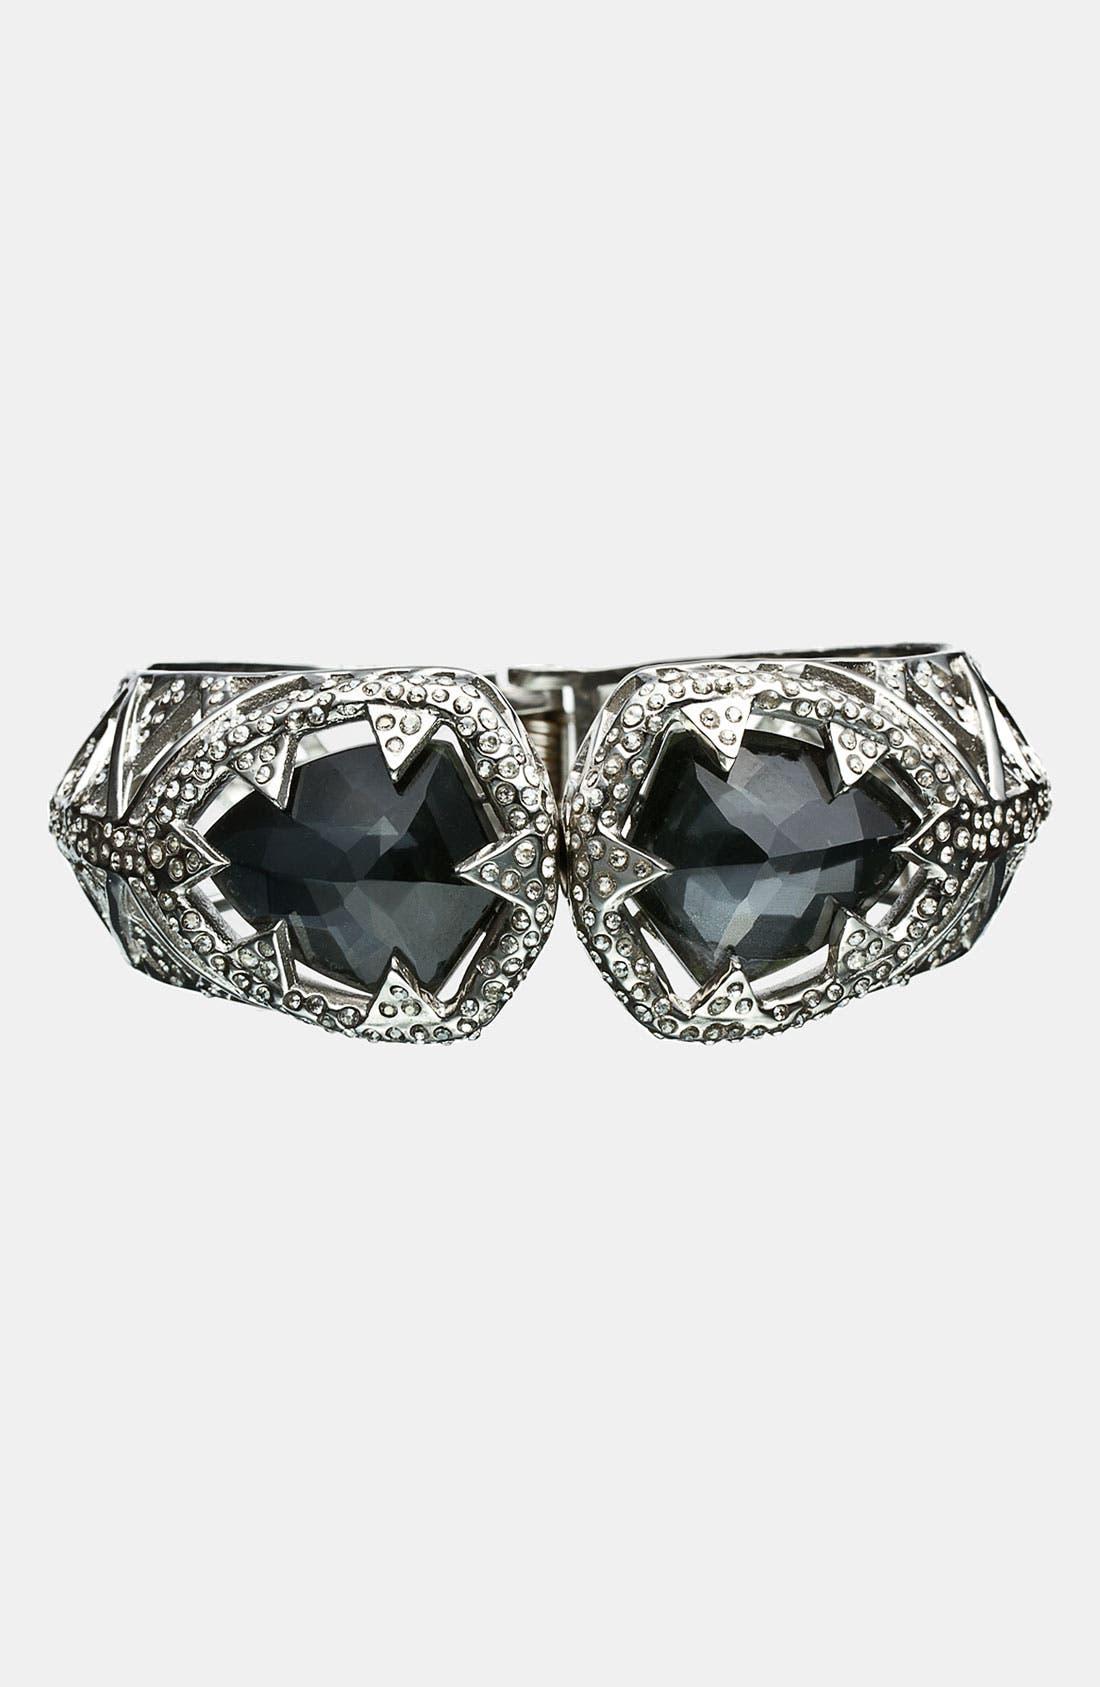 Alternate Image 1 Selected - Alexis Bittar 'Miss Havisham - Delano' Hinged Bracelet